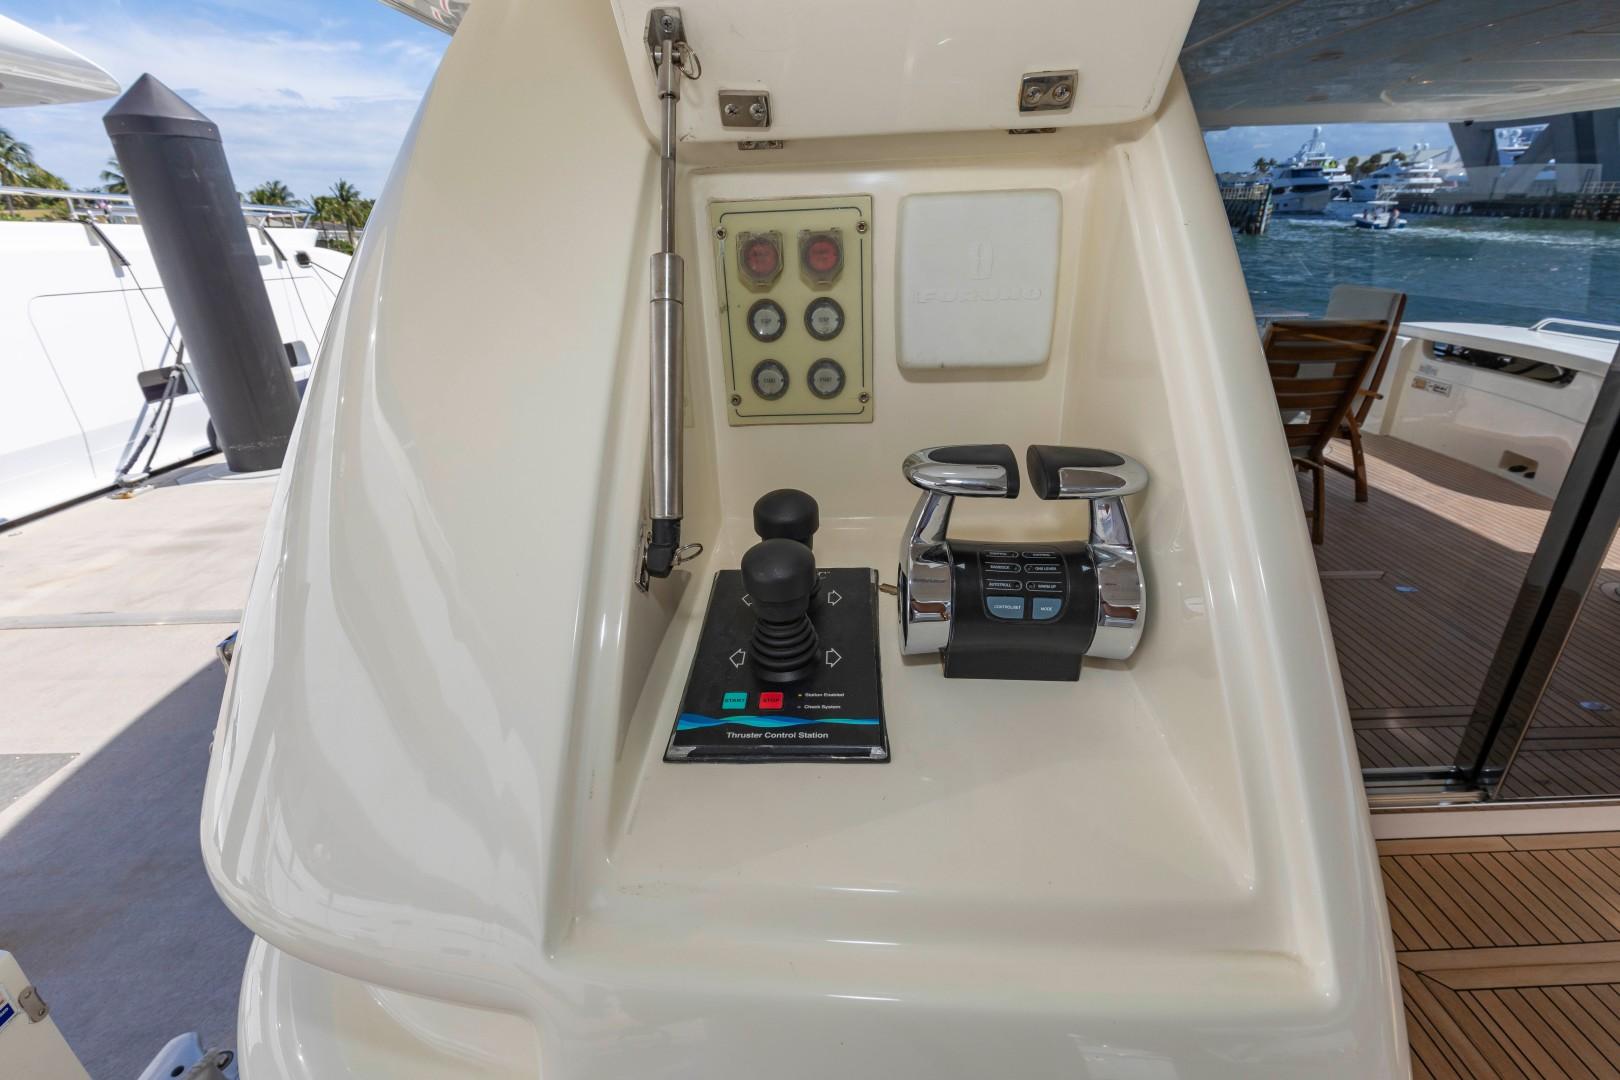 Ferretti Yachts-830HT 2010-MI RX Fort Lauderdale-Florida-United States-Aft Controls-1644668 | Thumbnail